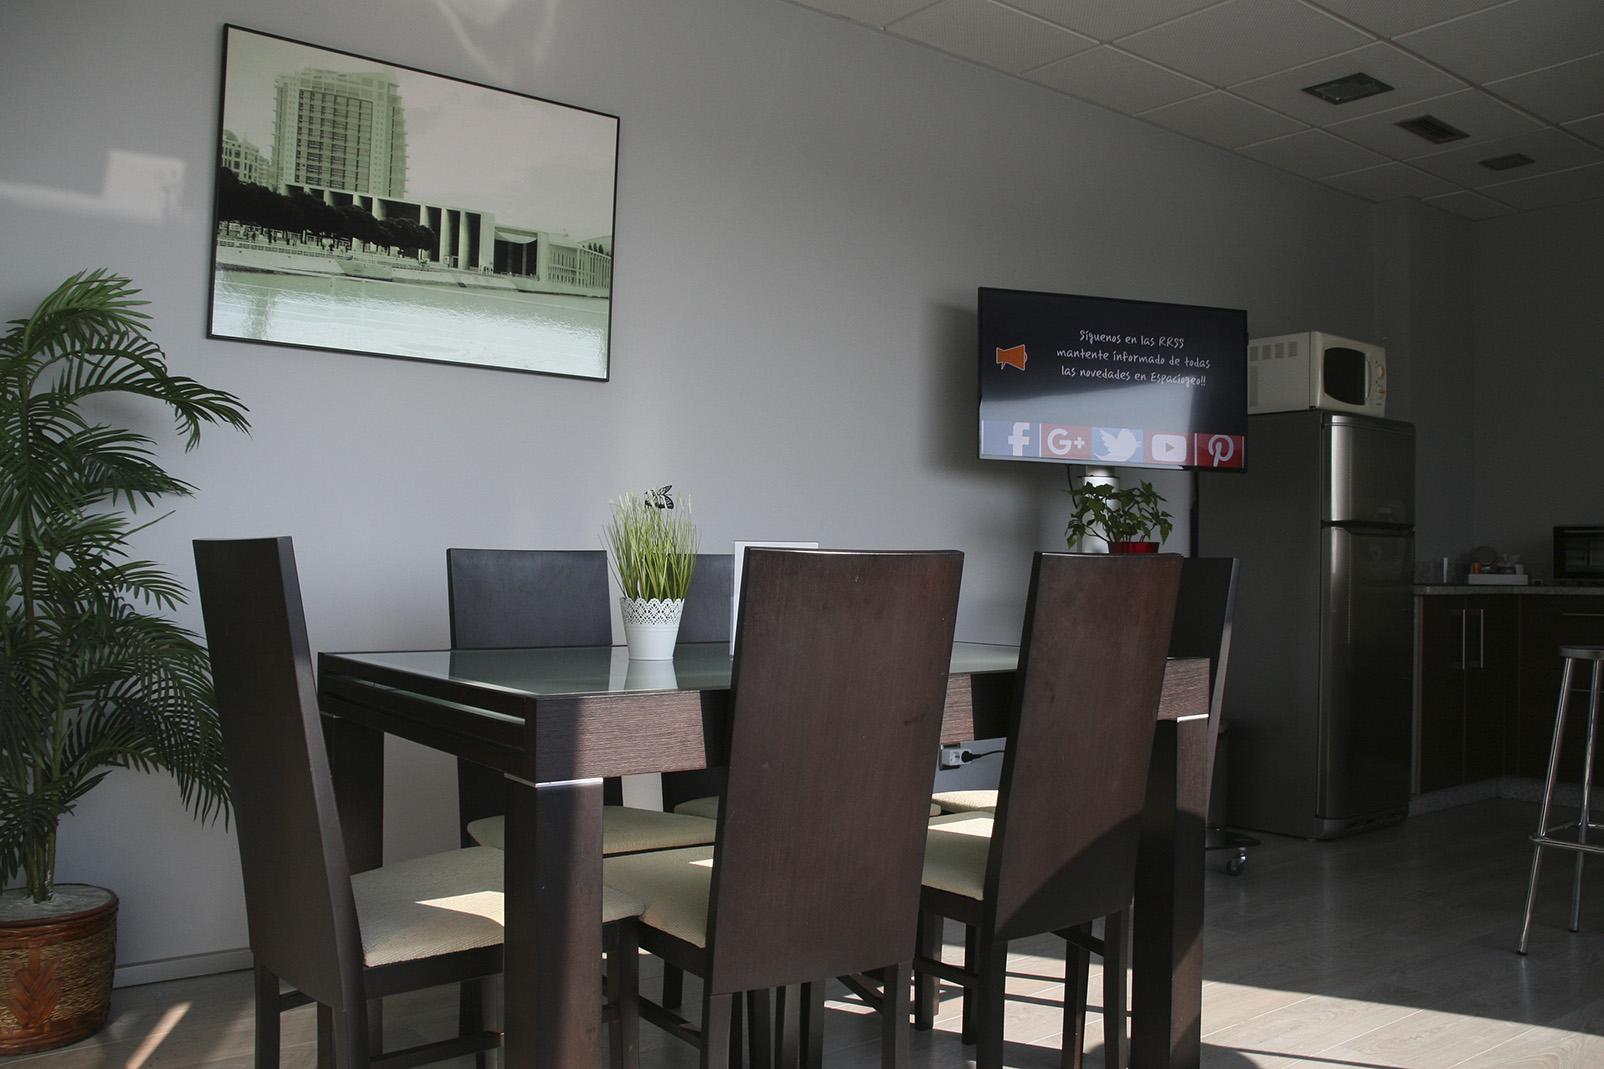 Office para clientes en Espaciogeo Vigo